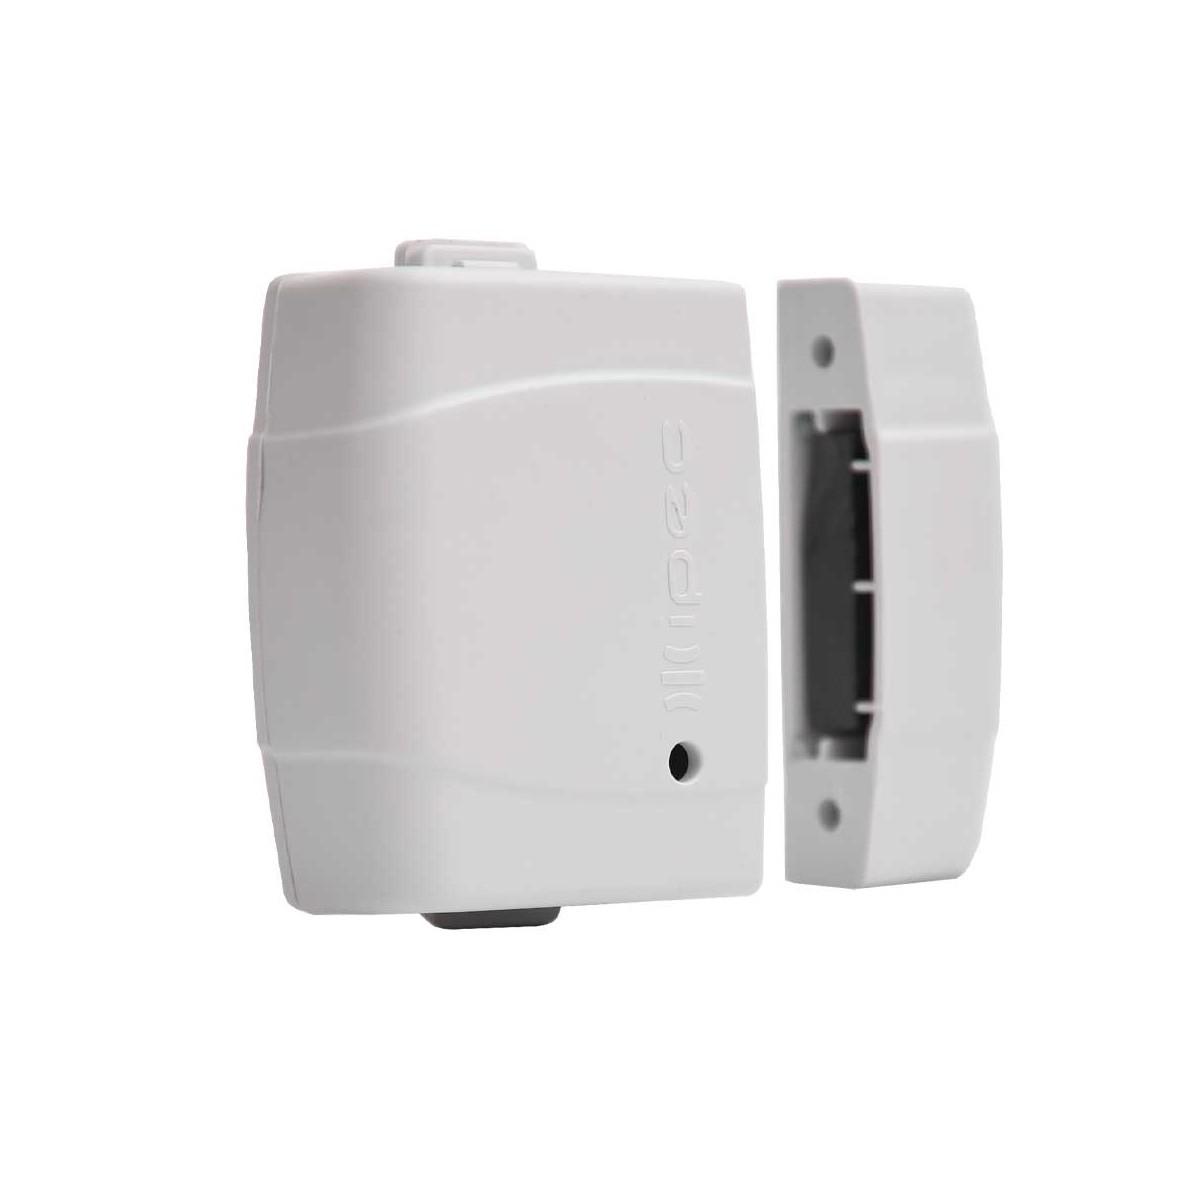 5pcs Sensor Magnético Sem Fio Alarme Residencial Portas Janelas Saw 433,92mhz Ipec